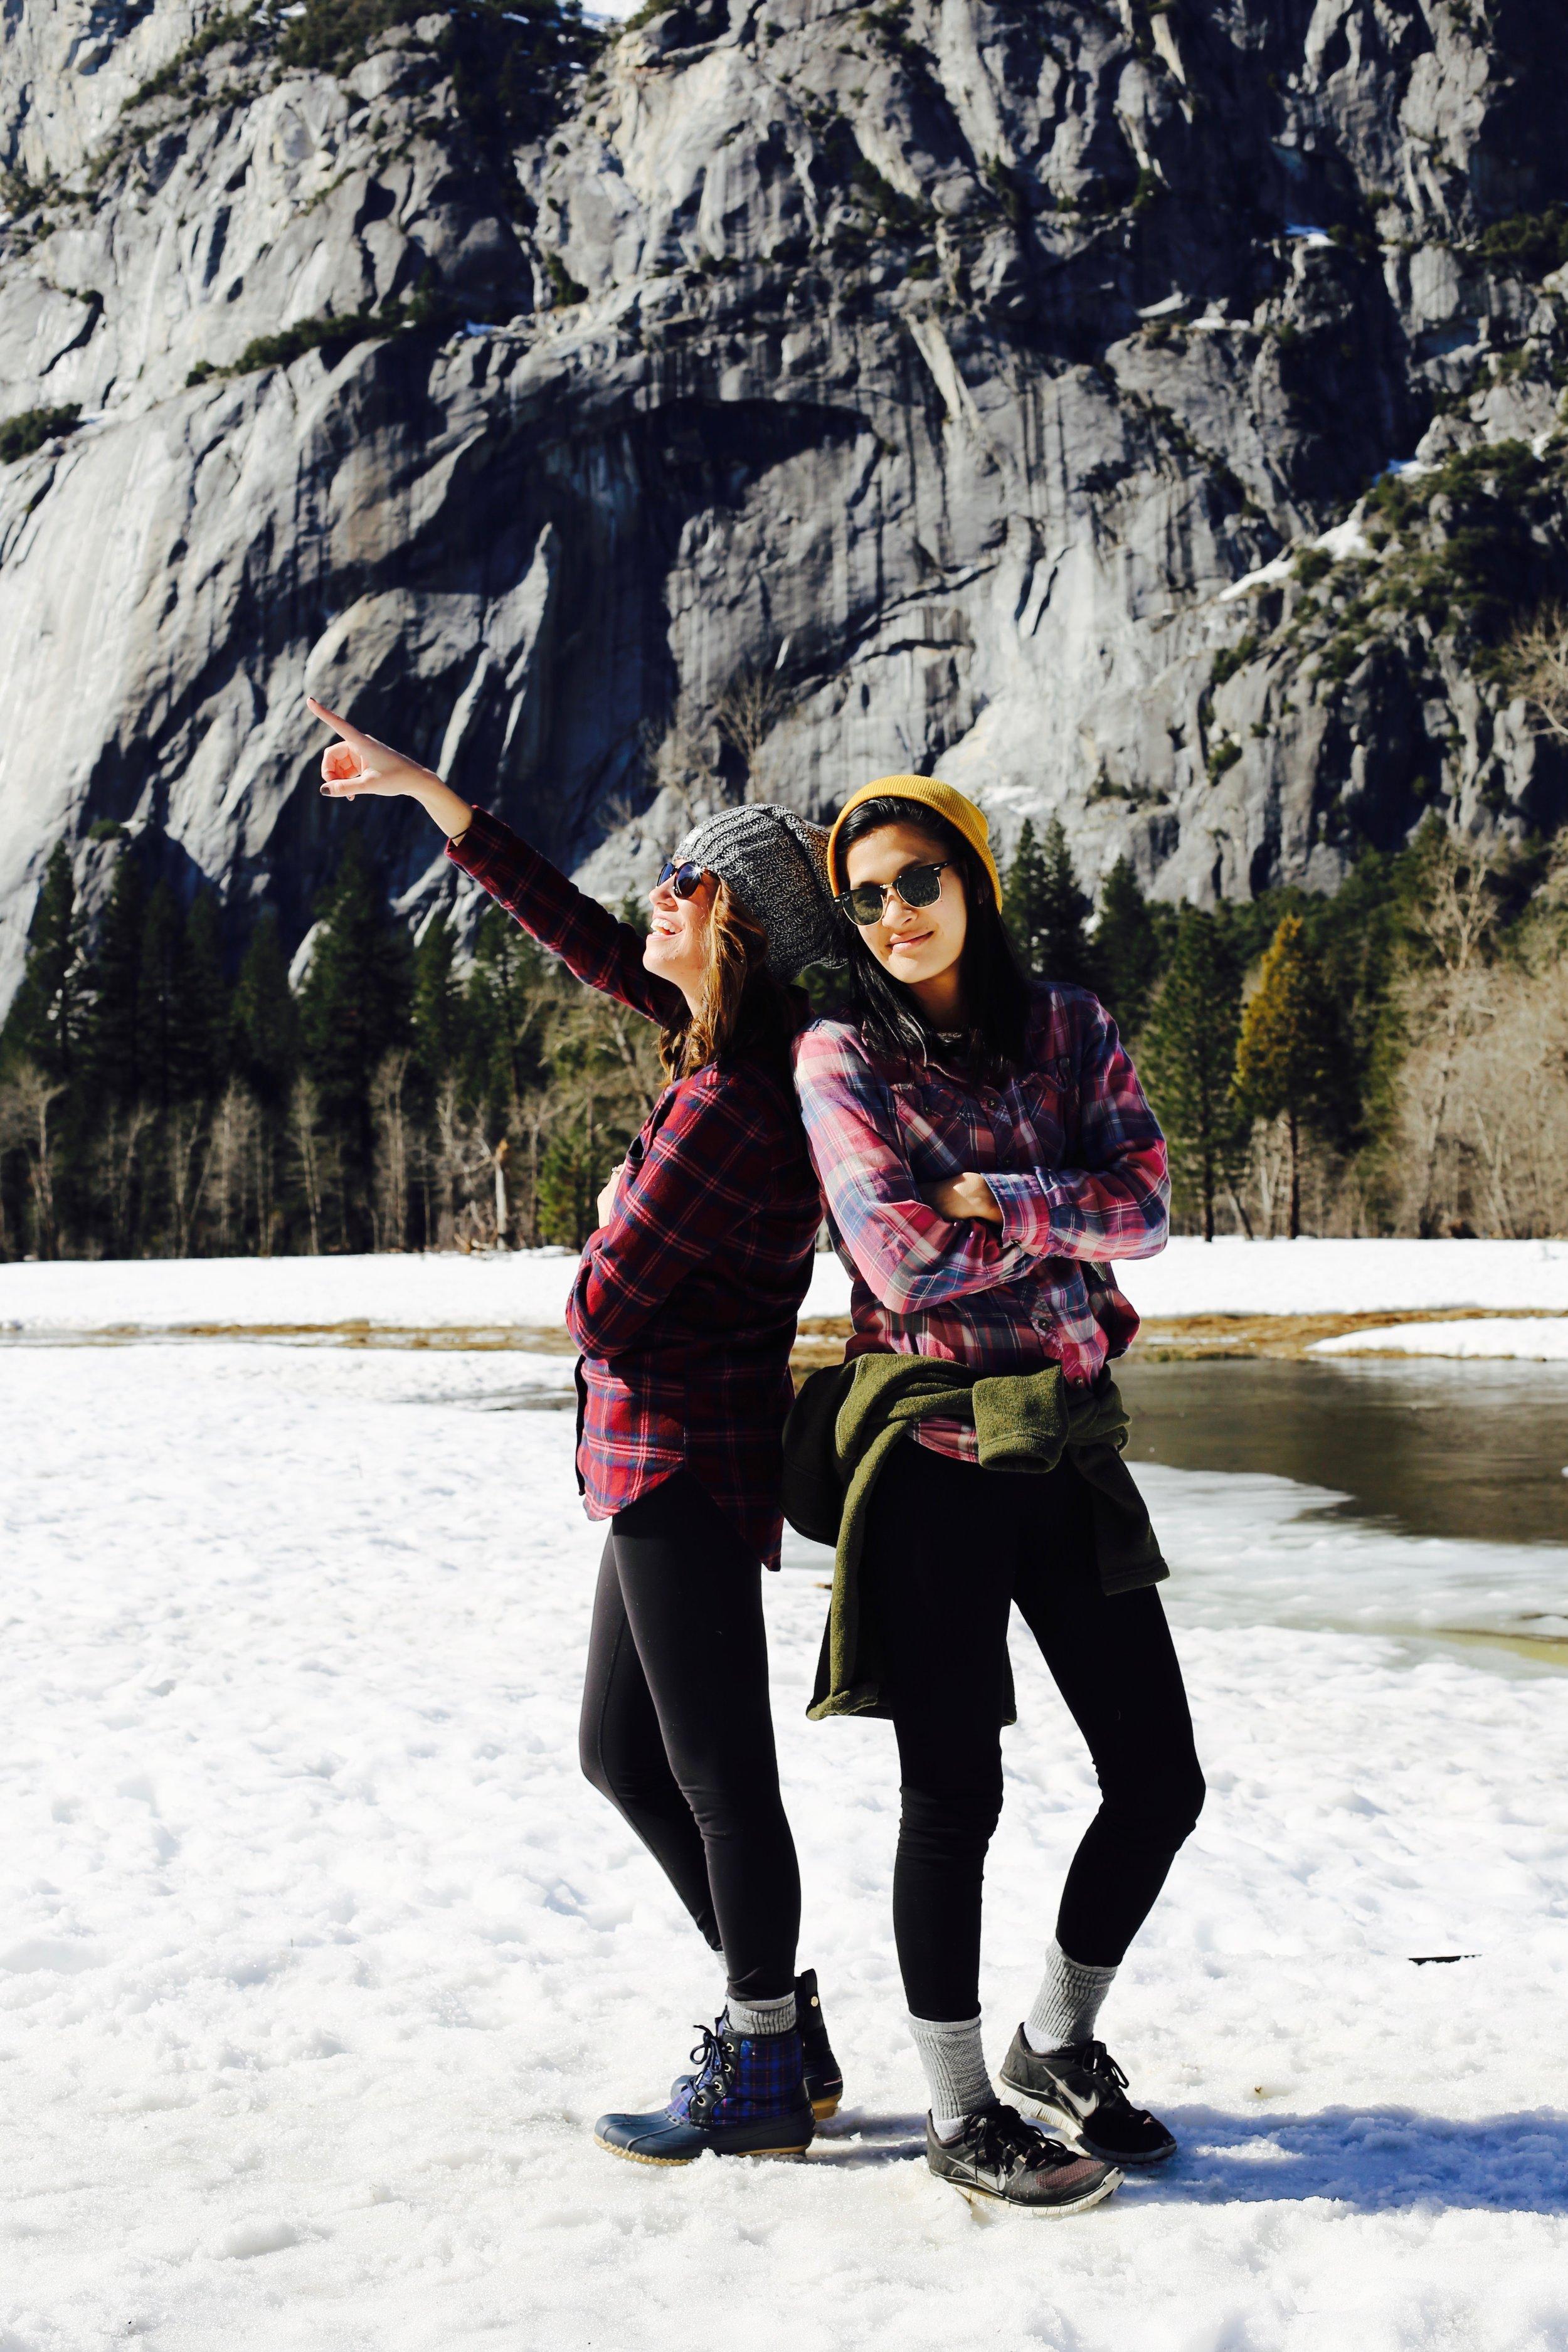 yosemite-valley-trip-girls.jpg